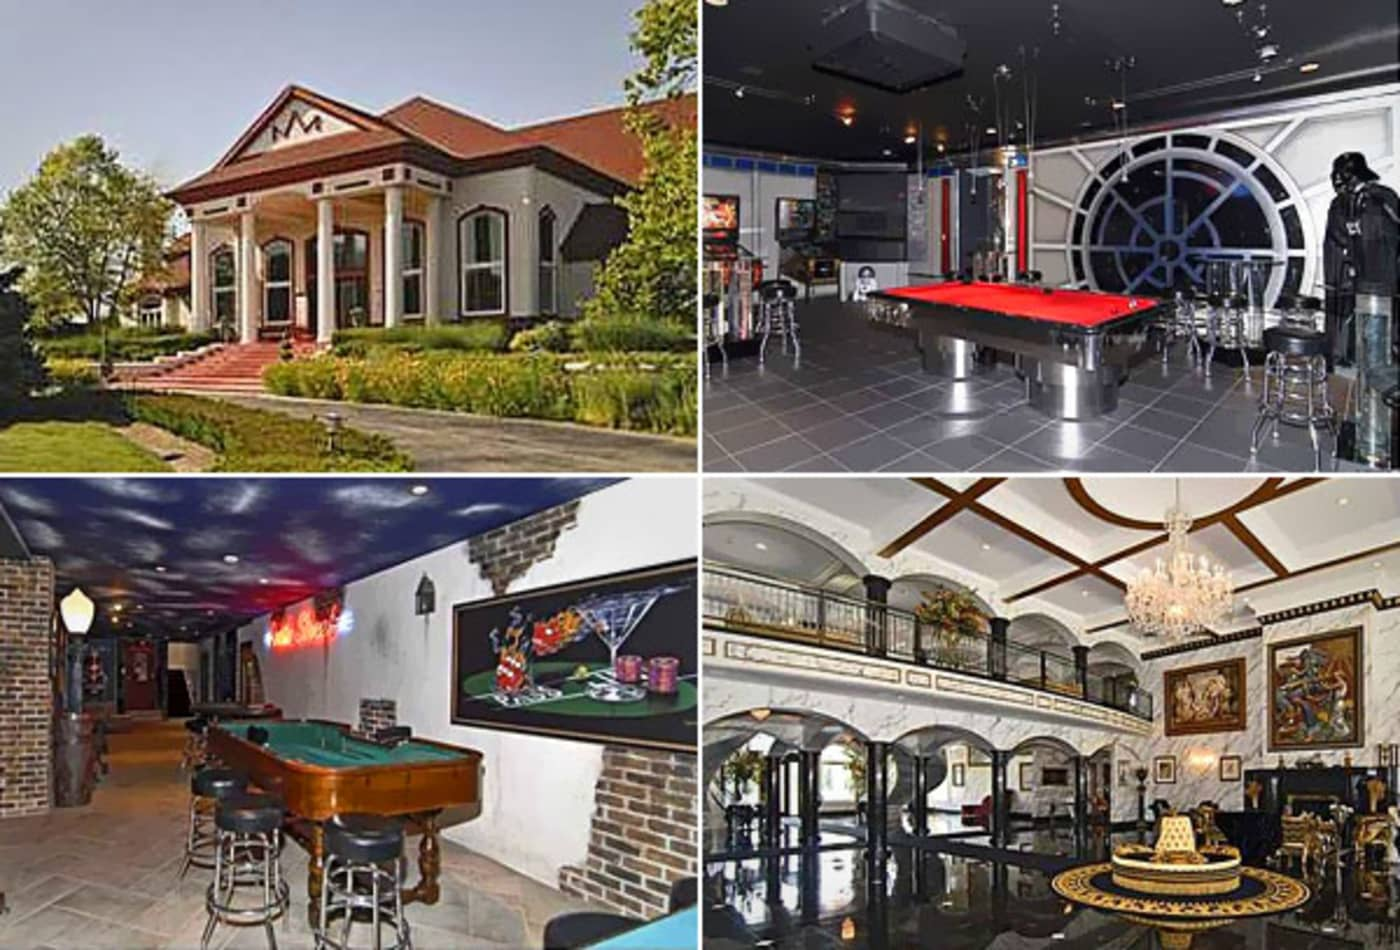 Star-Wars-Bar-Carmel-Indiana-Obsession-Homes-CNBC.jpg